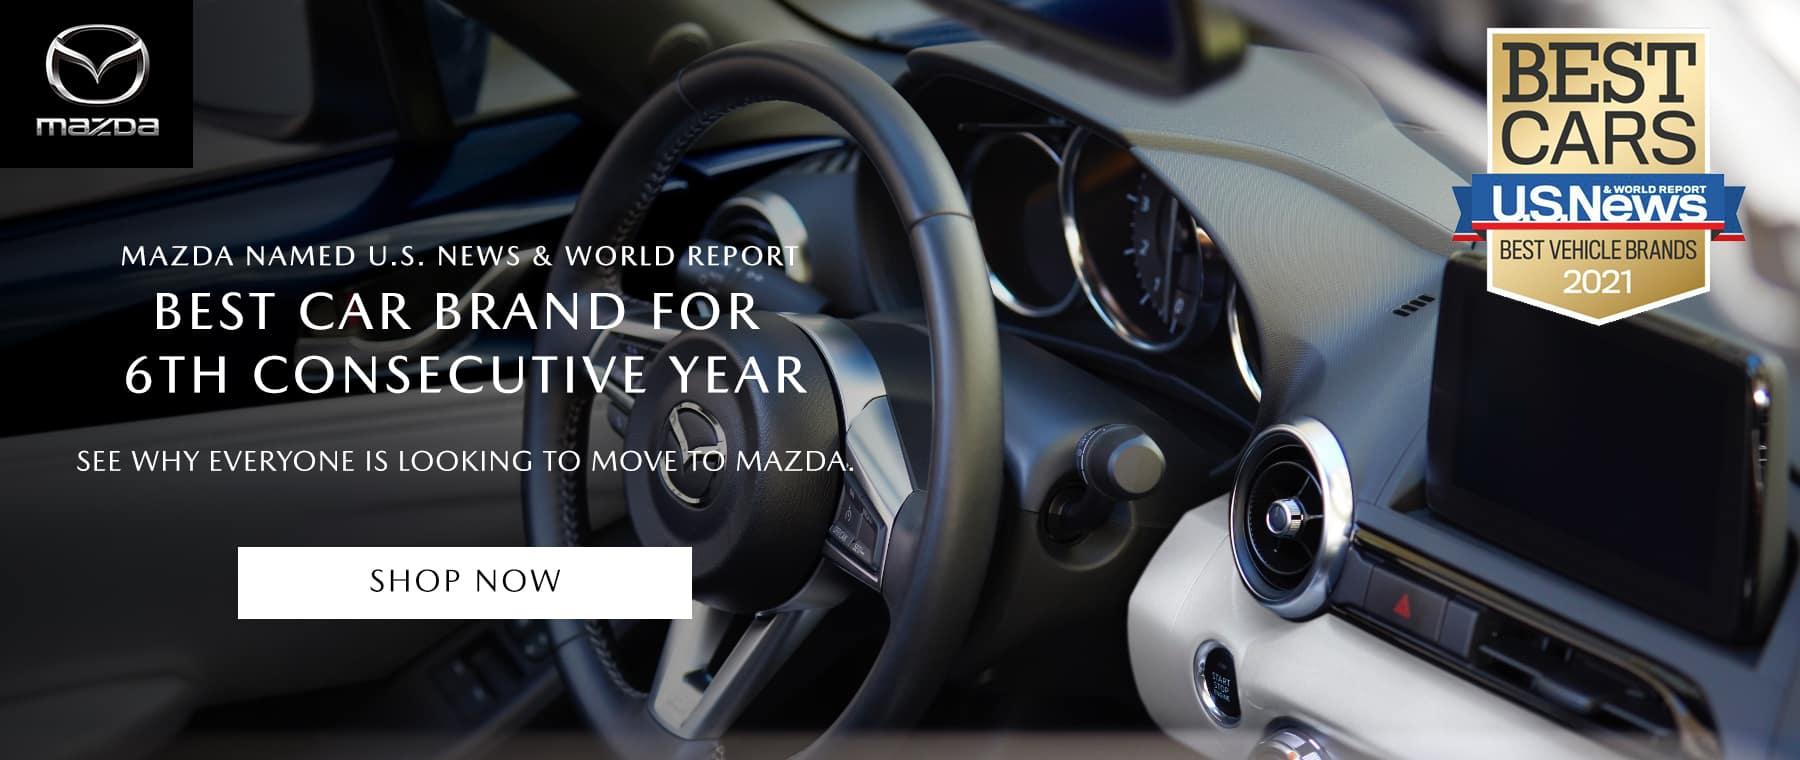 MAZDA NAMED U.S. NEWS & WORLD REPORT BEST CAR BRAND